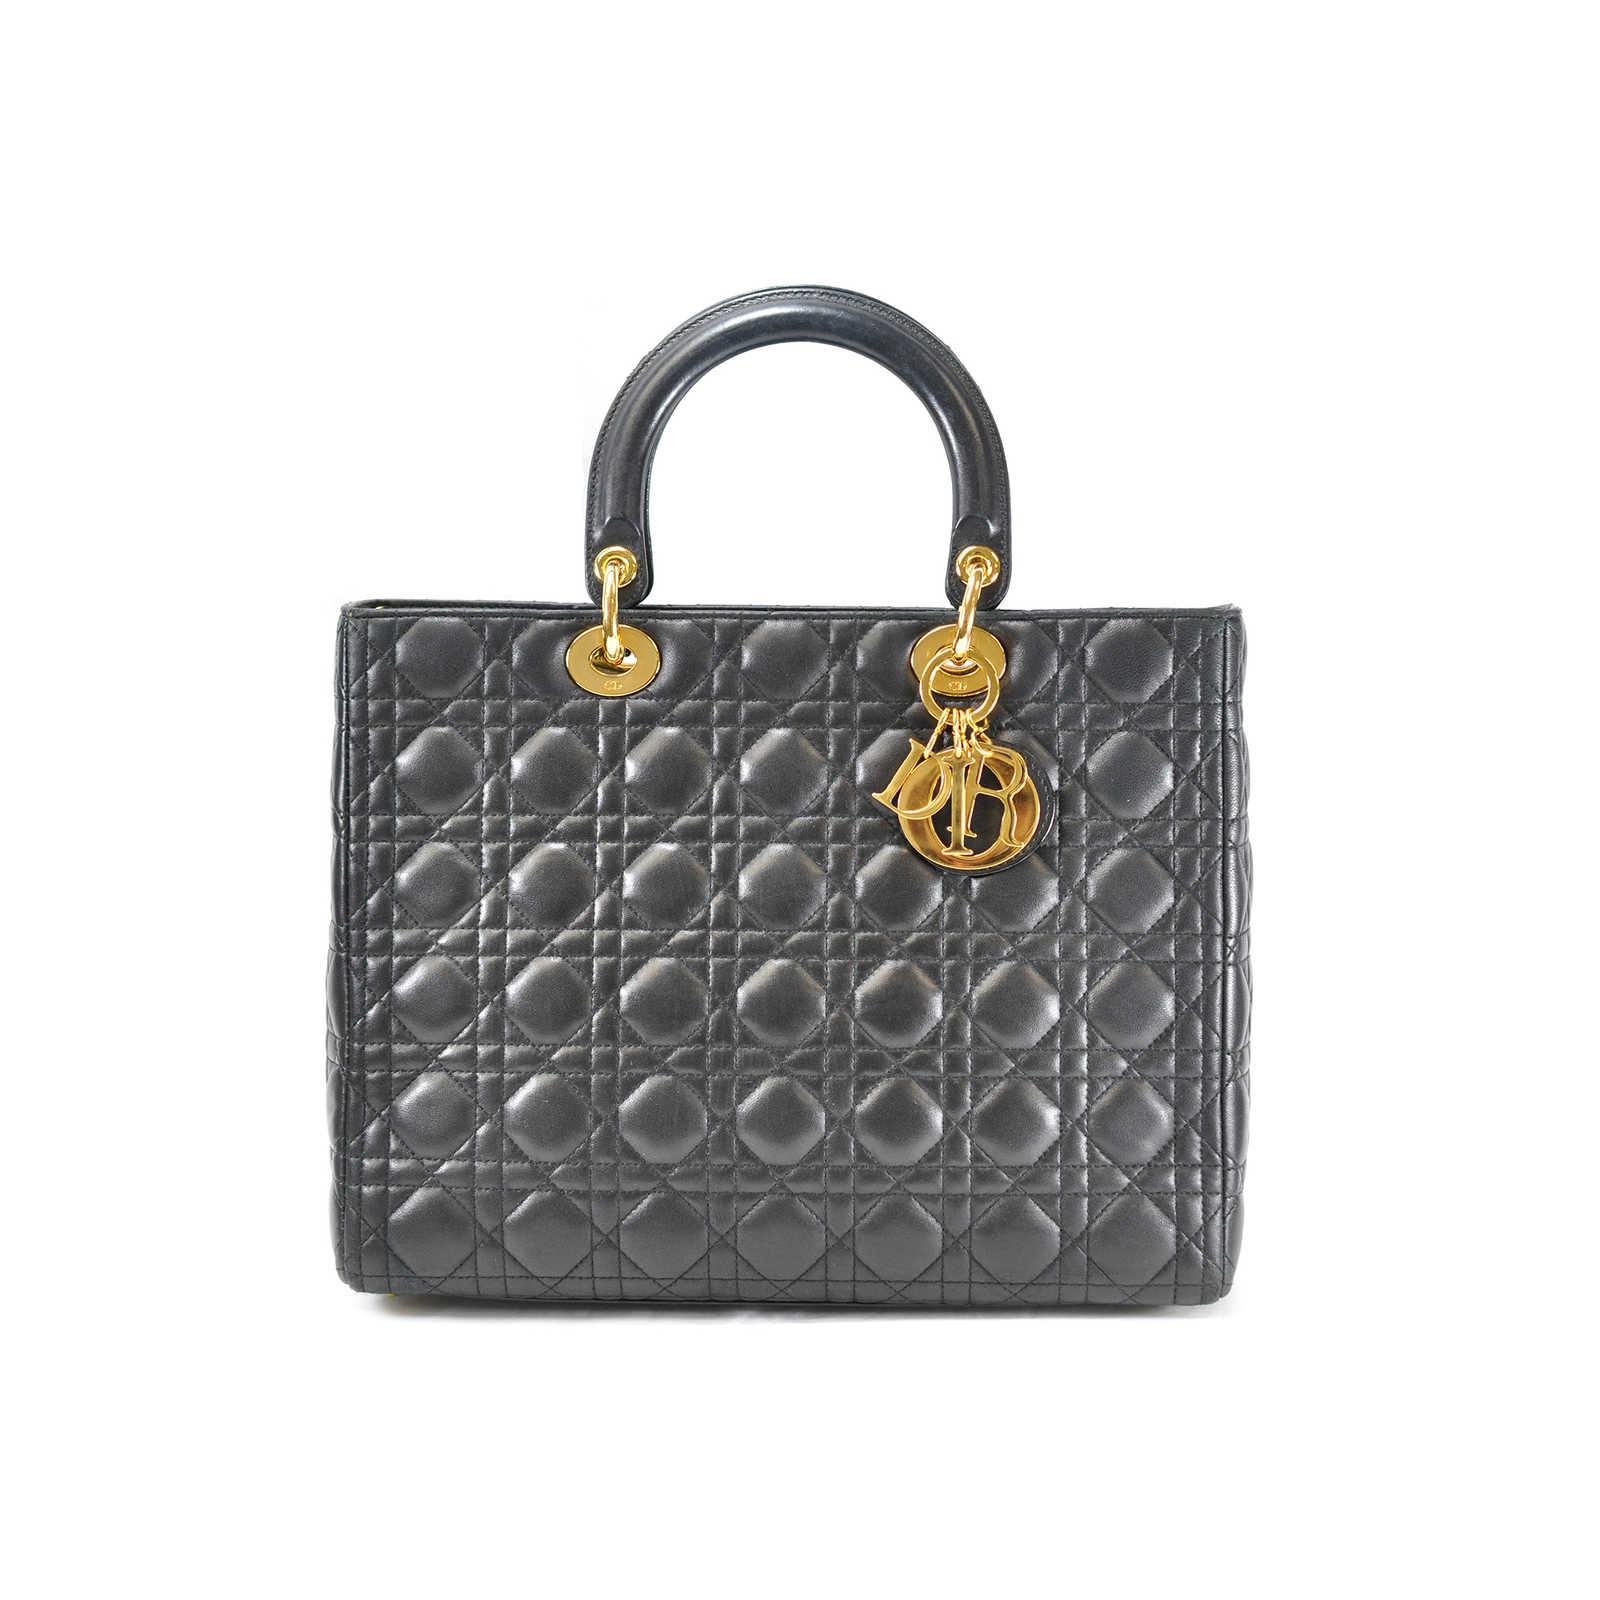 4c6b268aecf Authentic Vintage Christian Dior Large Lady Dior Bag (TFC-107-00008) ...